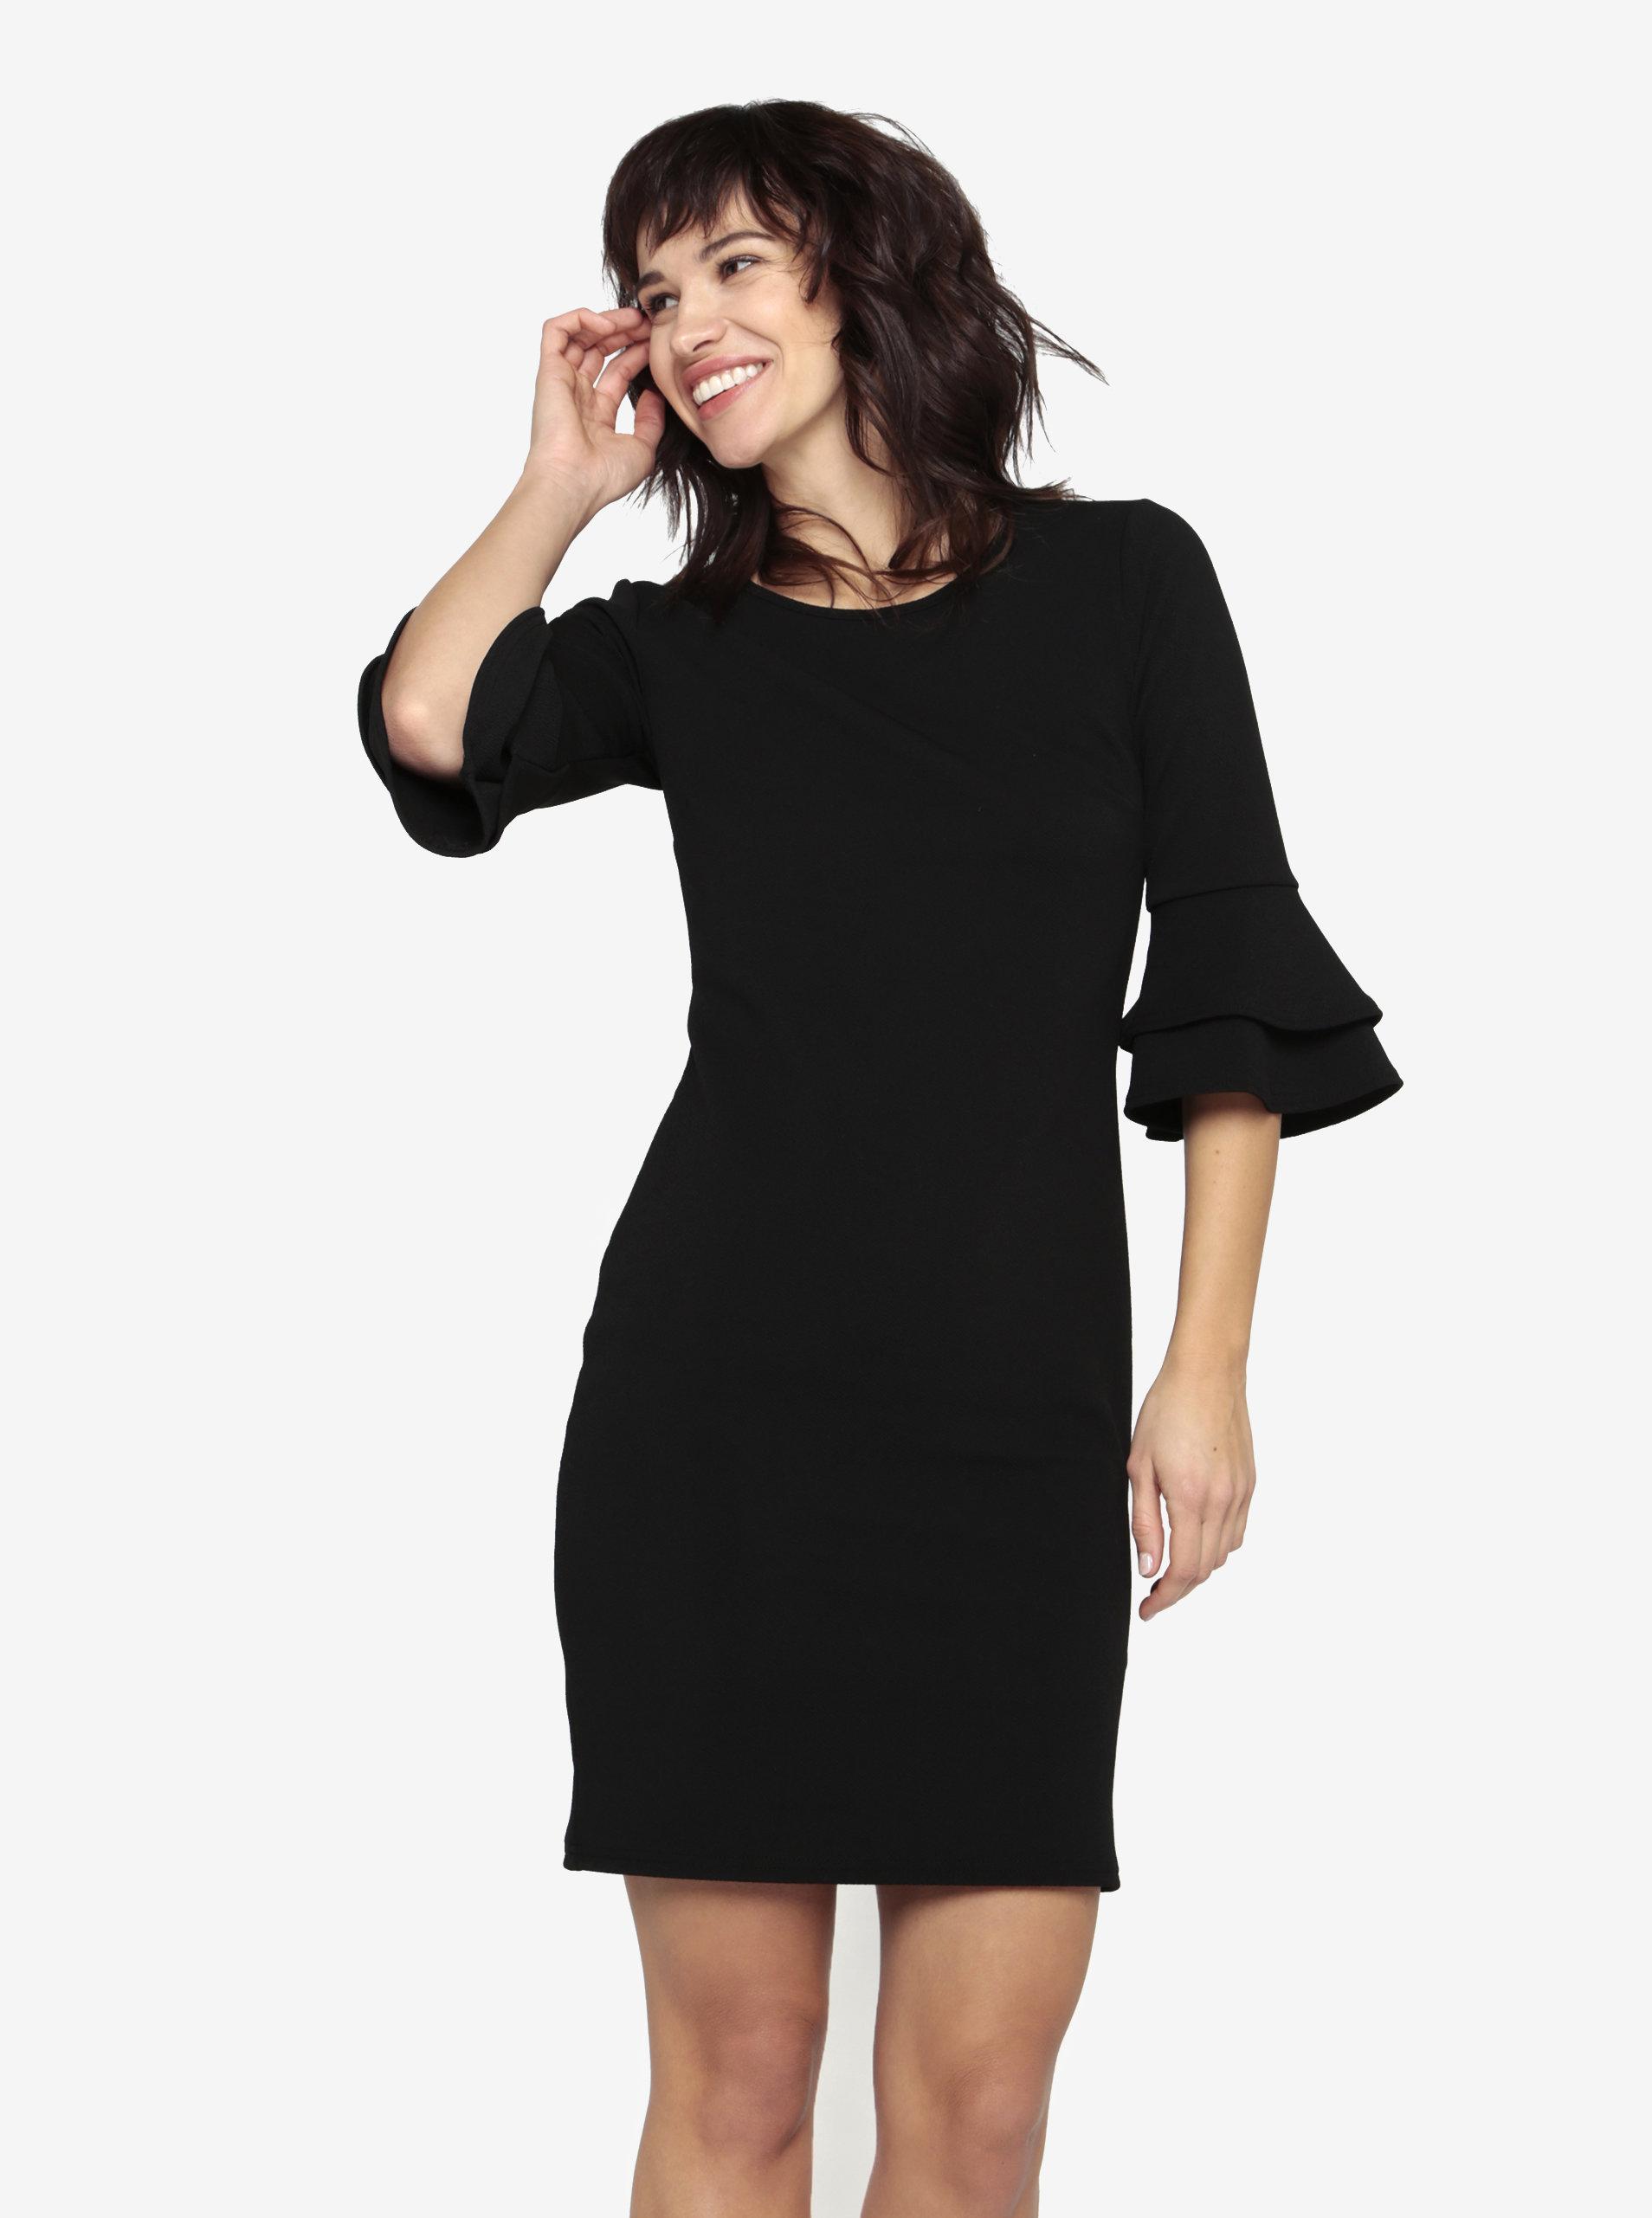 Černé pouzdrové šaty s 3 4 rukávem Dorothy Perkins ... ce7039da41